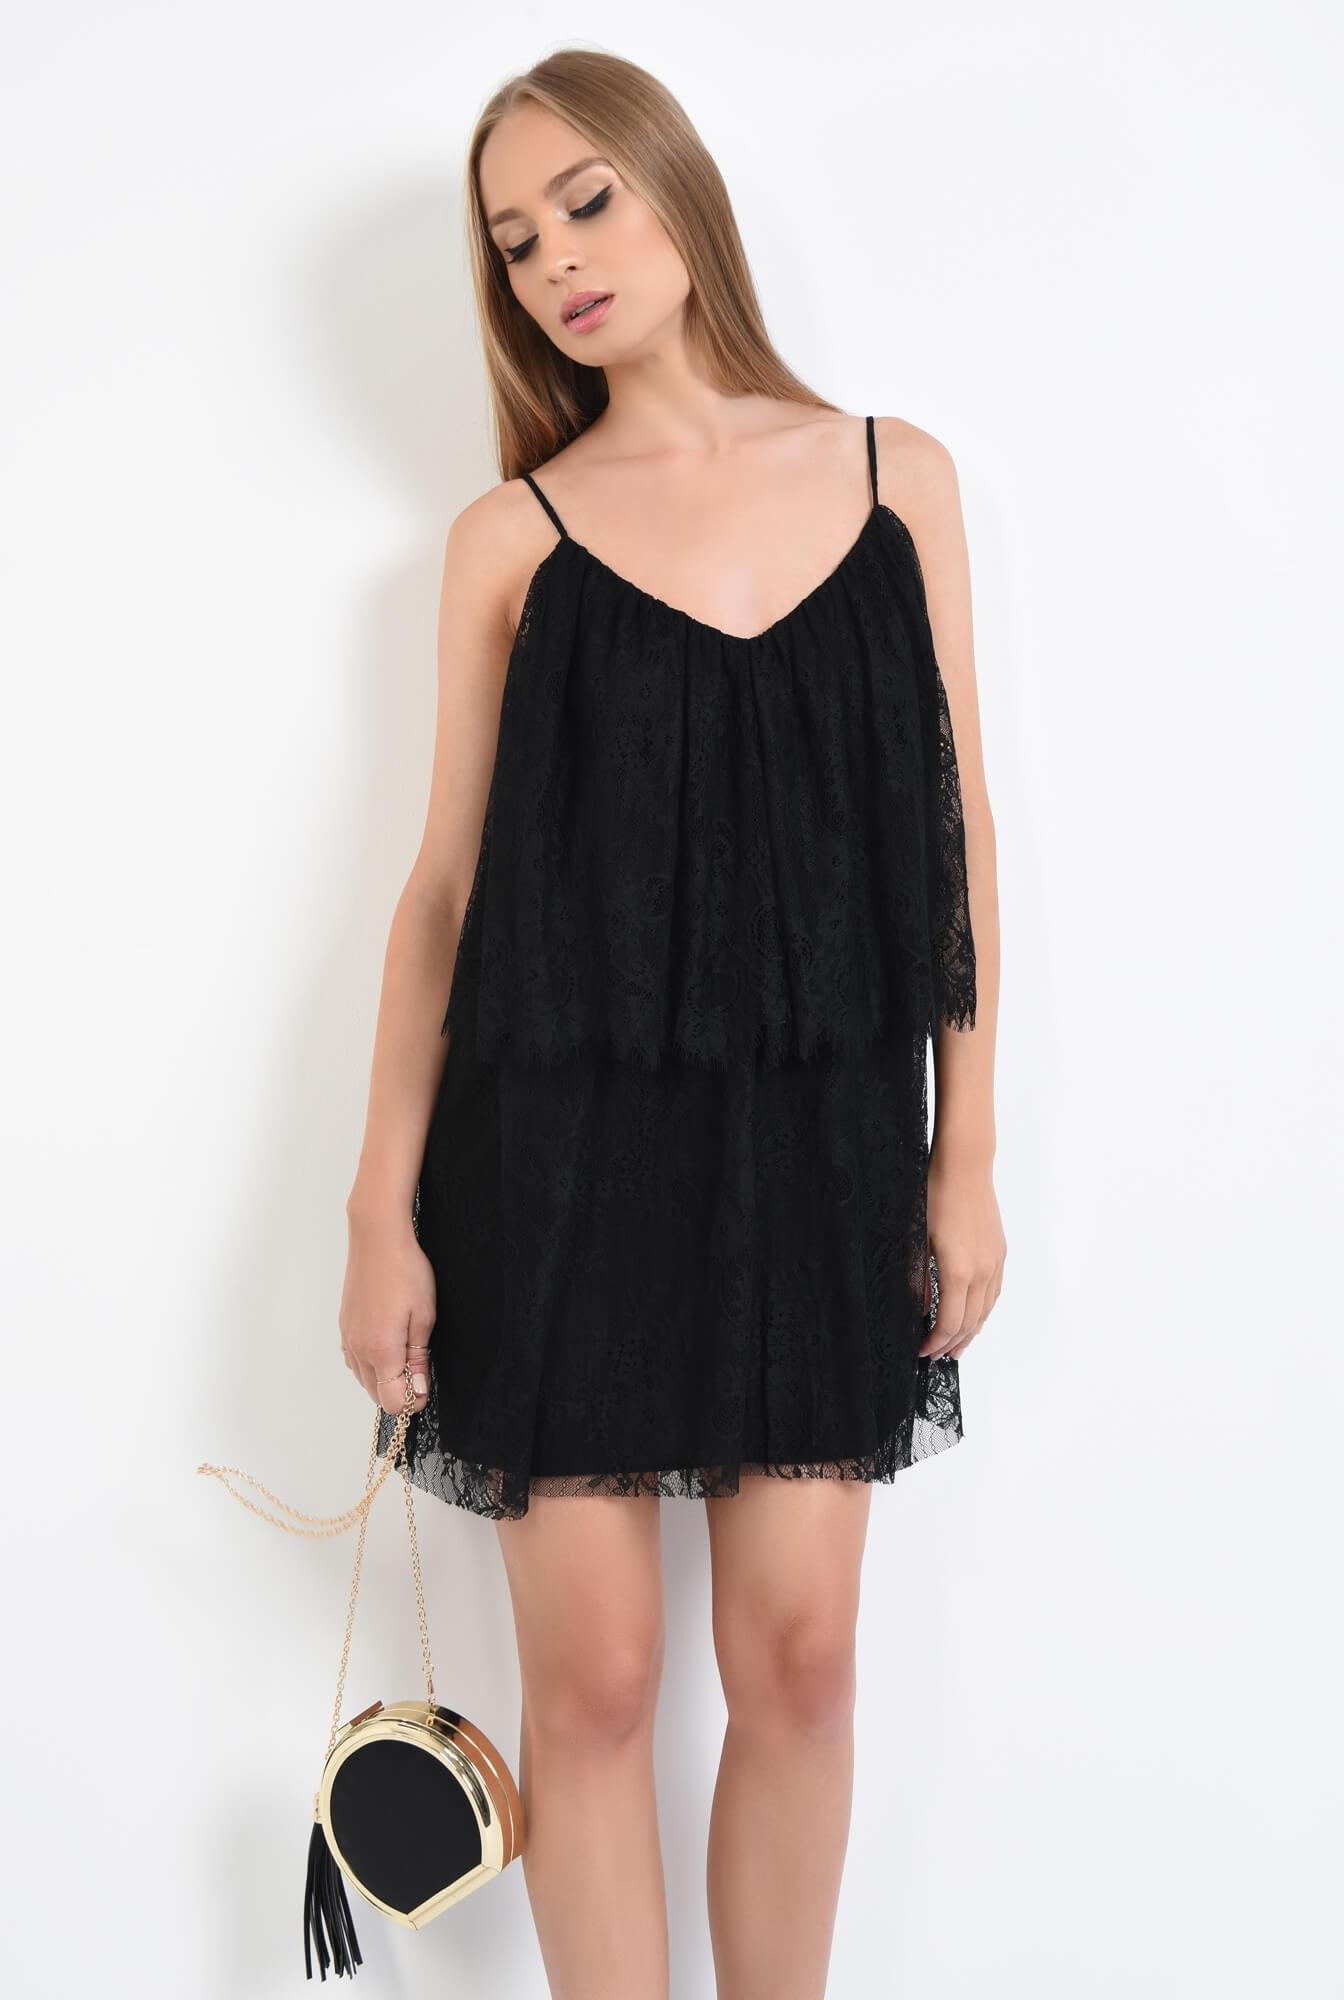 2 - rochie de seara, scurta, din dantela, negru, bretele subtiri